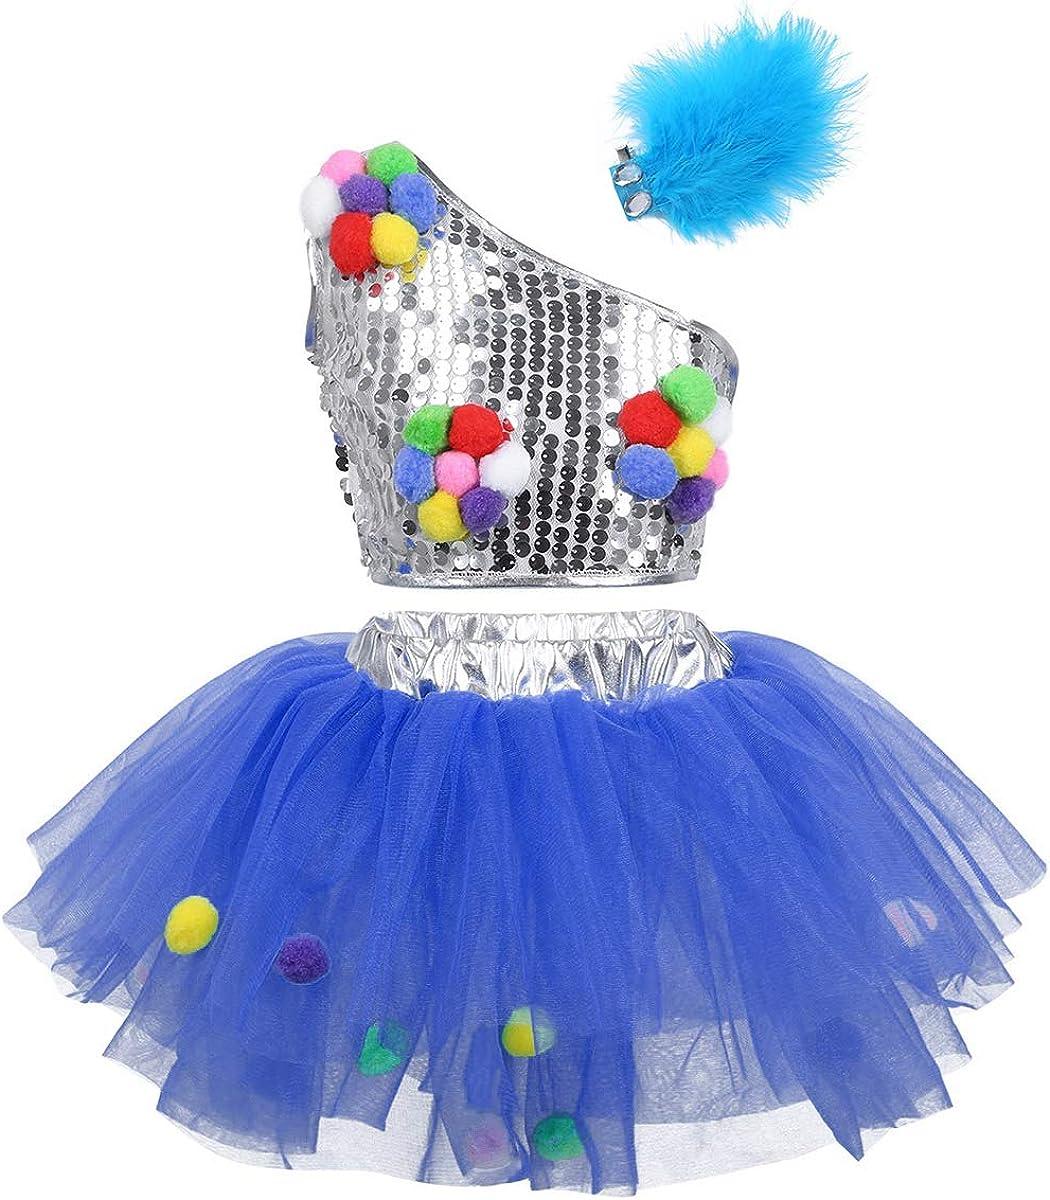 iiniim Kids Girls Daily Purchase bargain sale 3PCs One Shoulder Ballet P Dance Sequins Dress